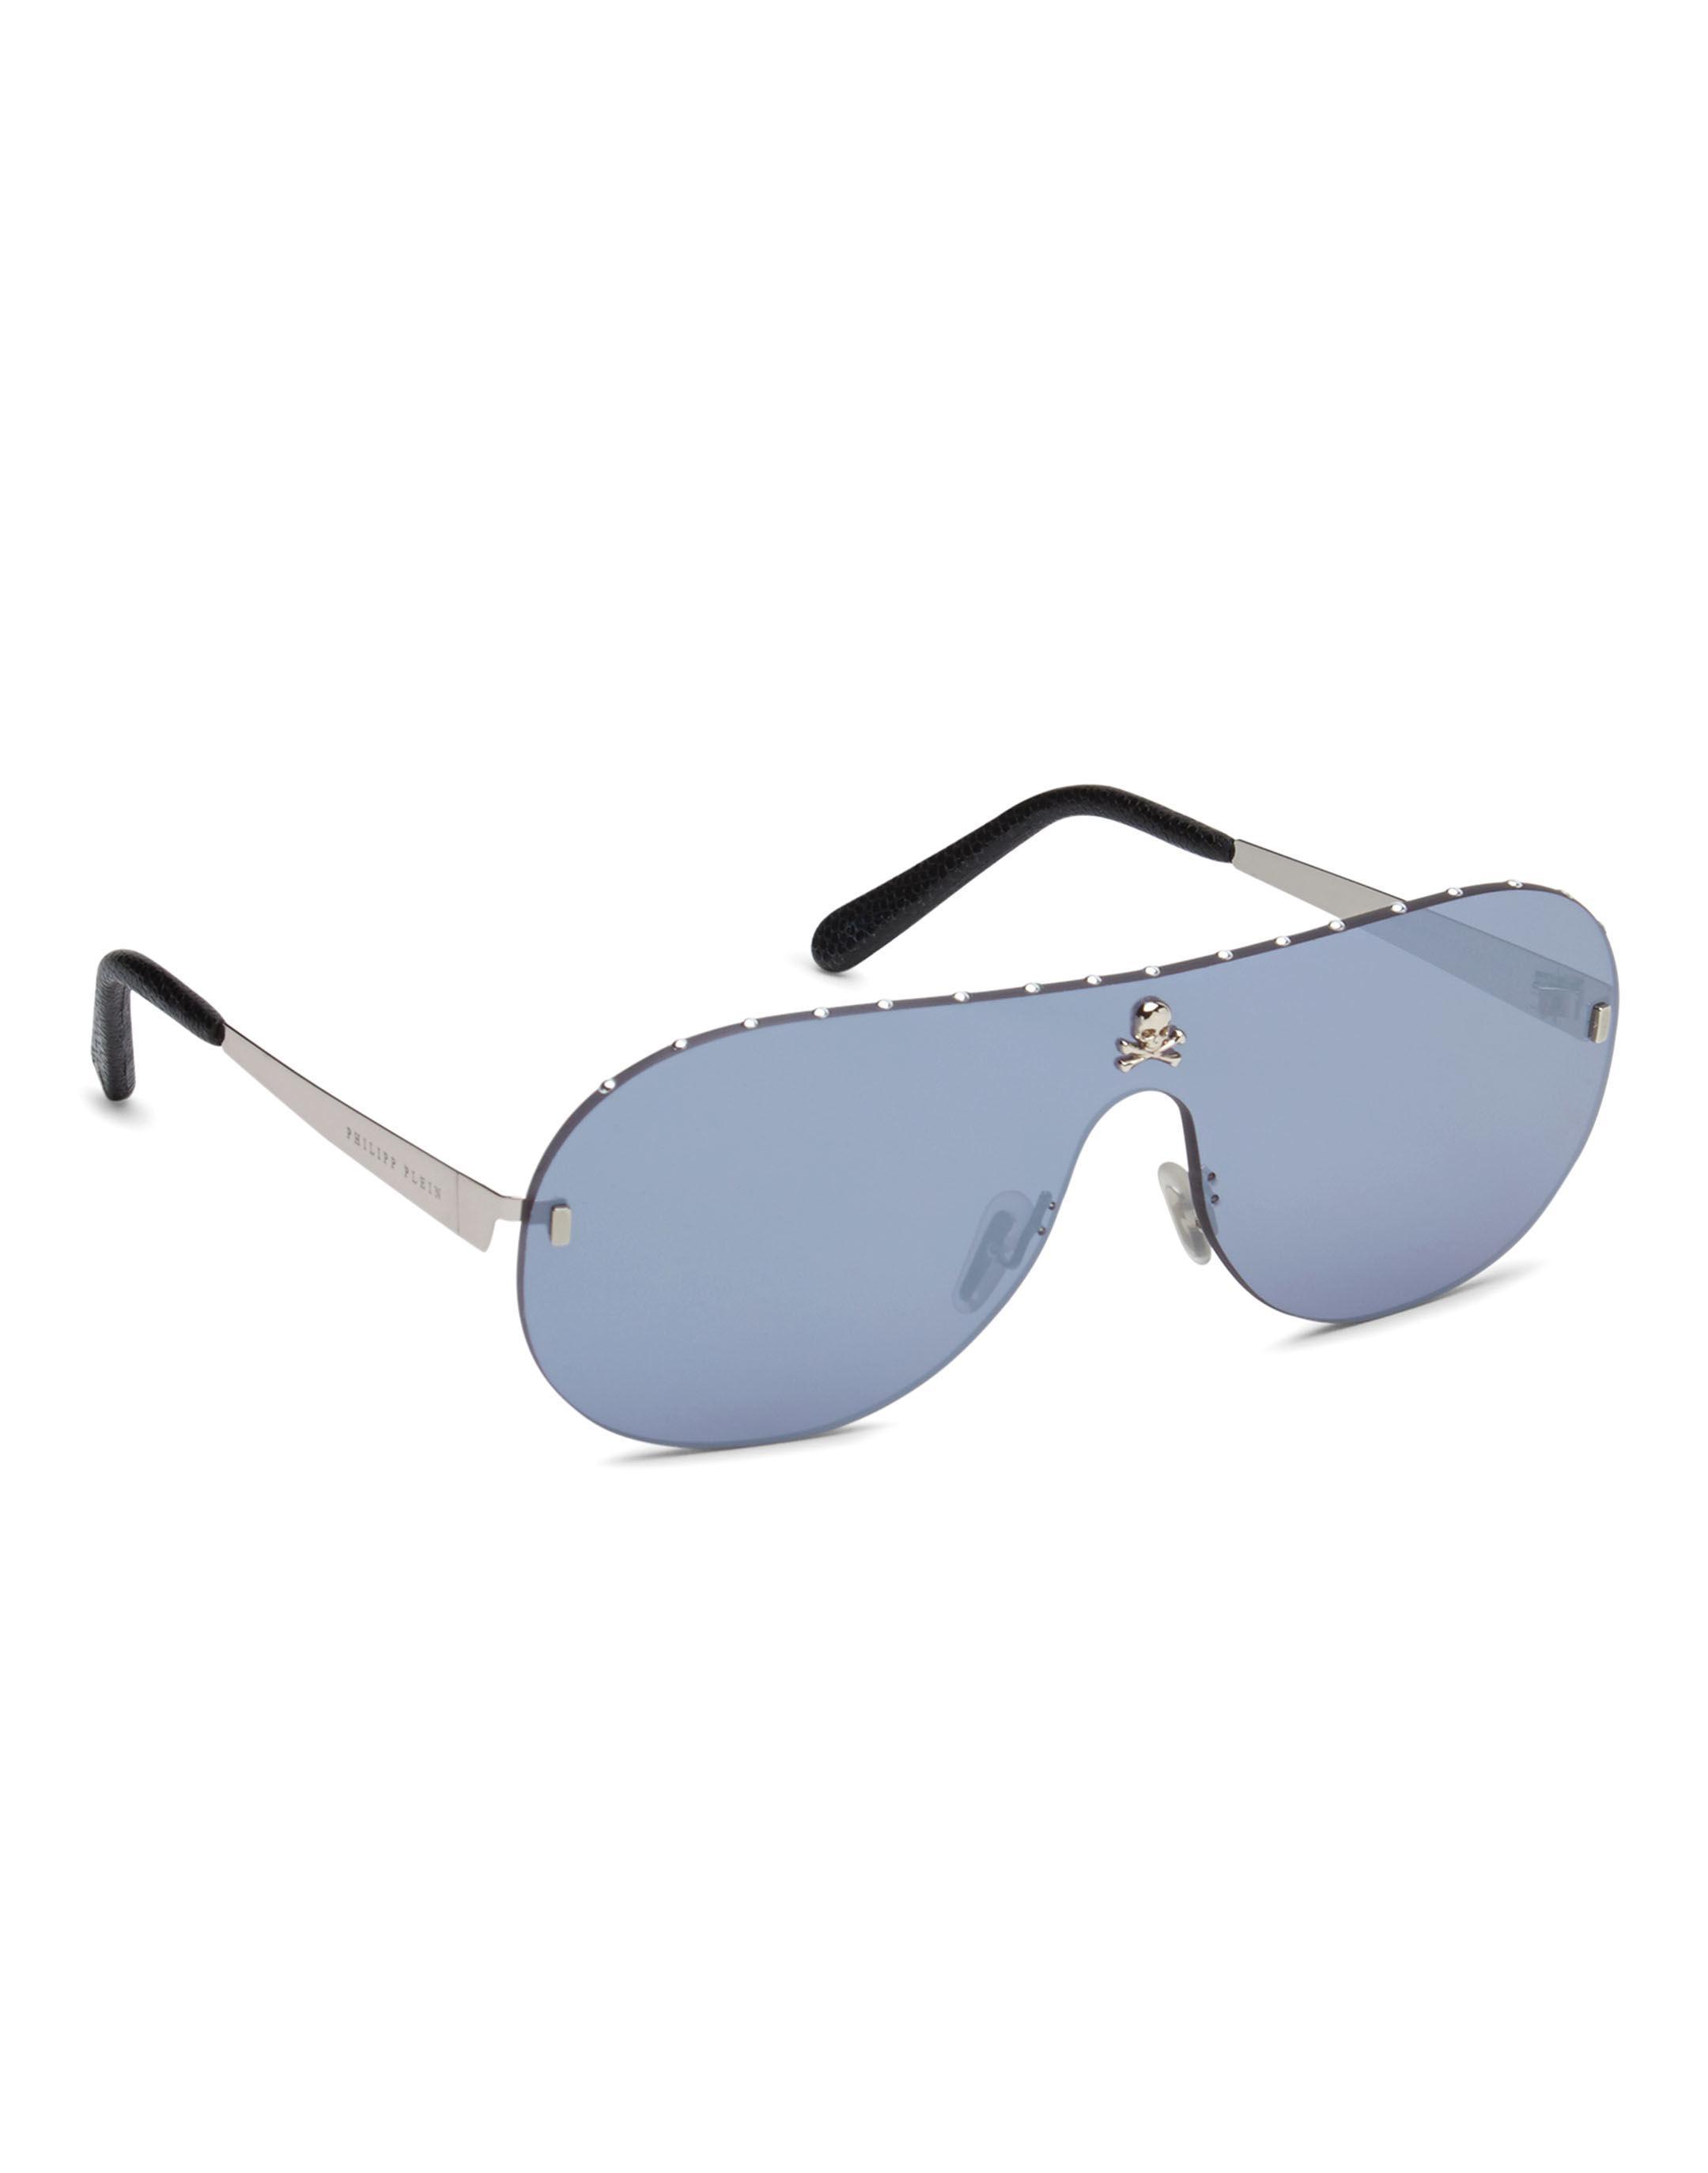 ce980d3a654 Philipp Plein. Women s Sunglasses Target Studs